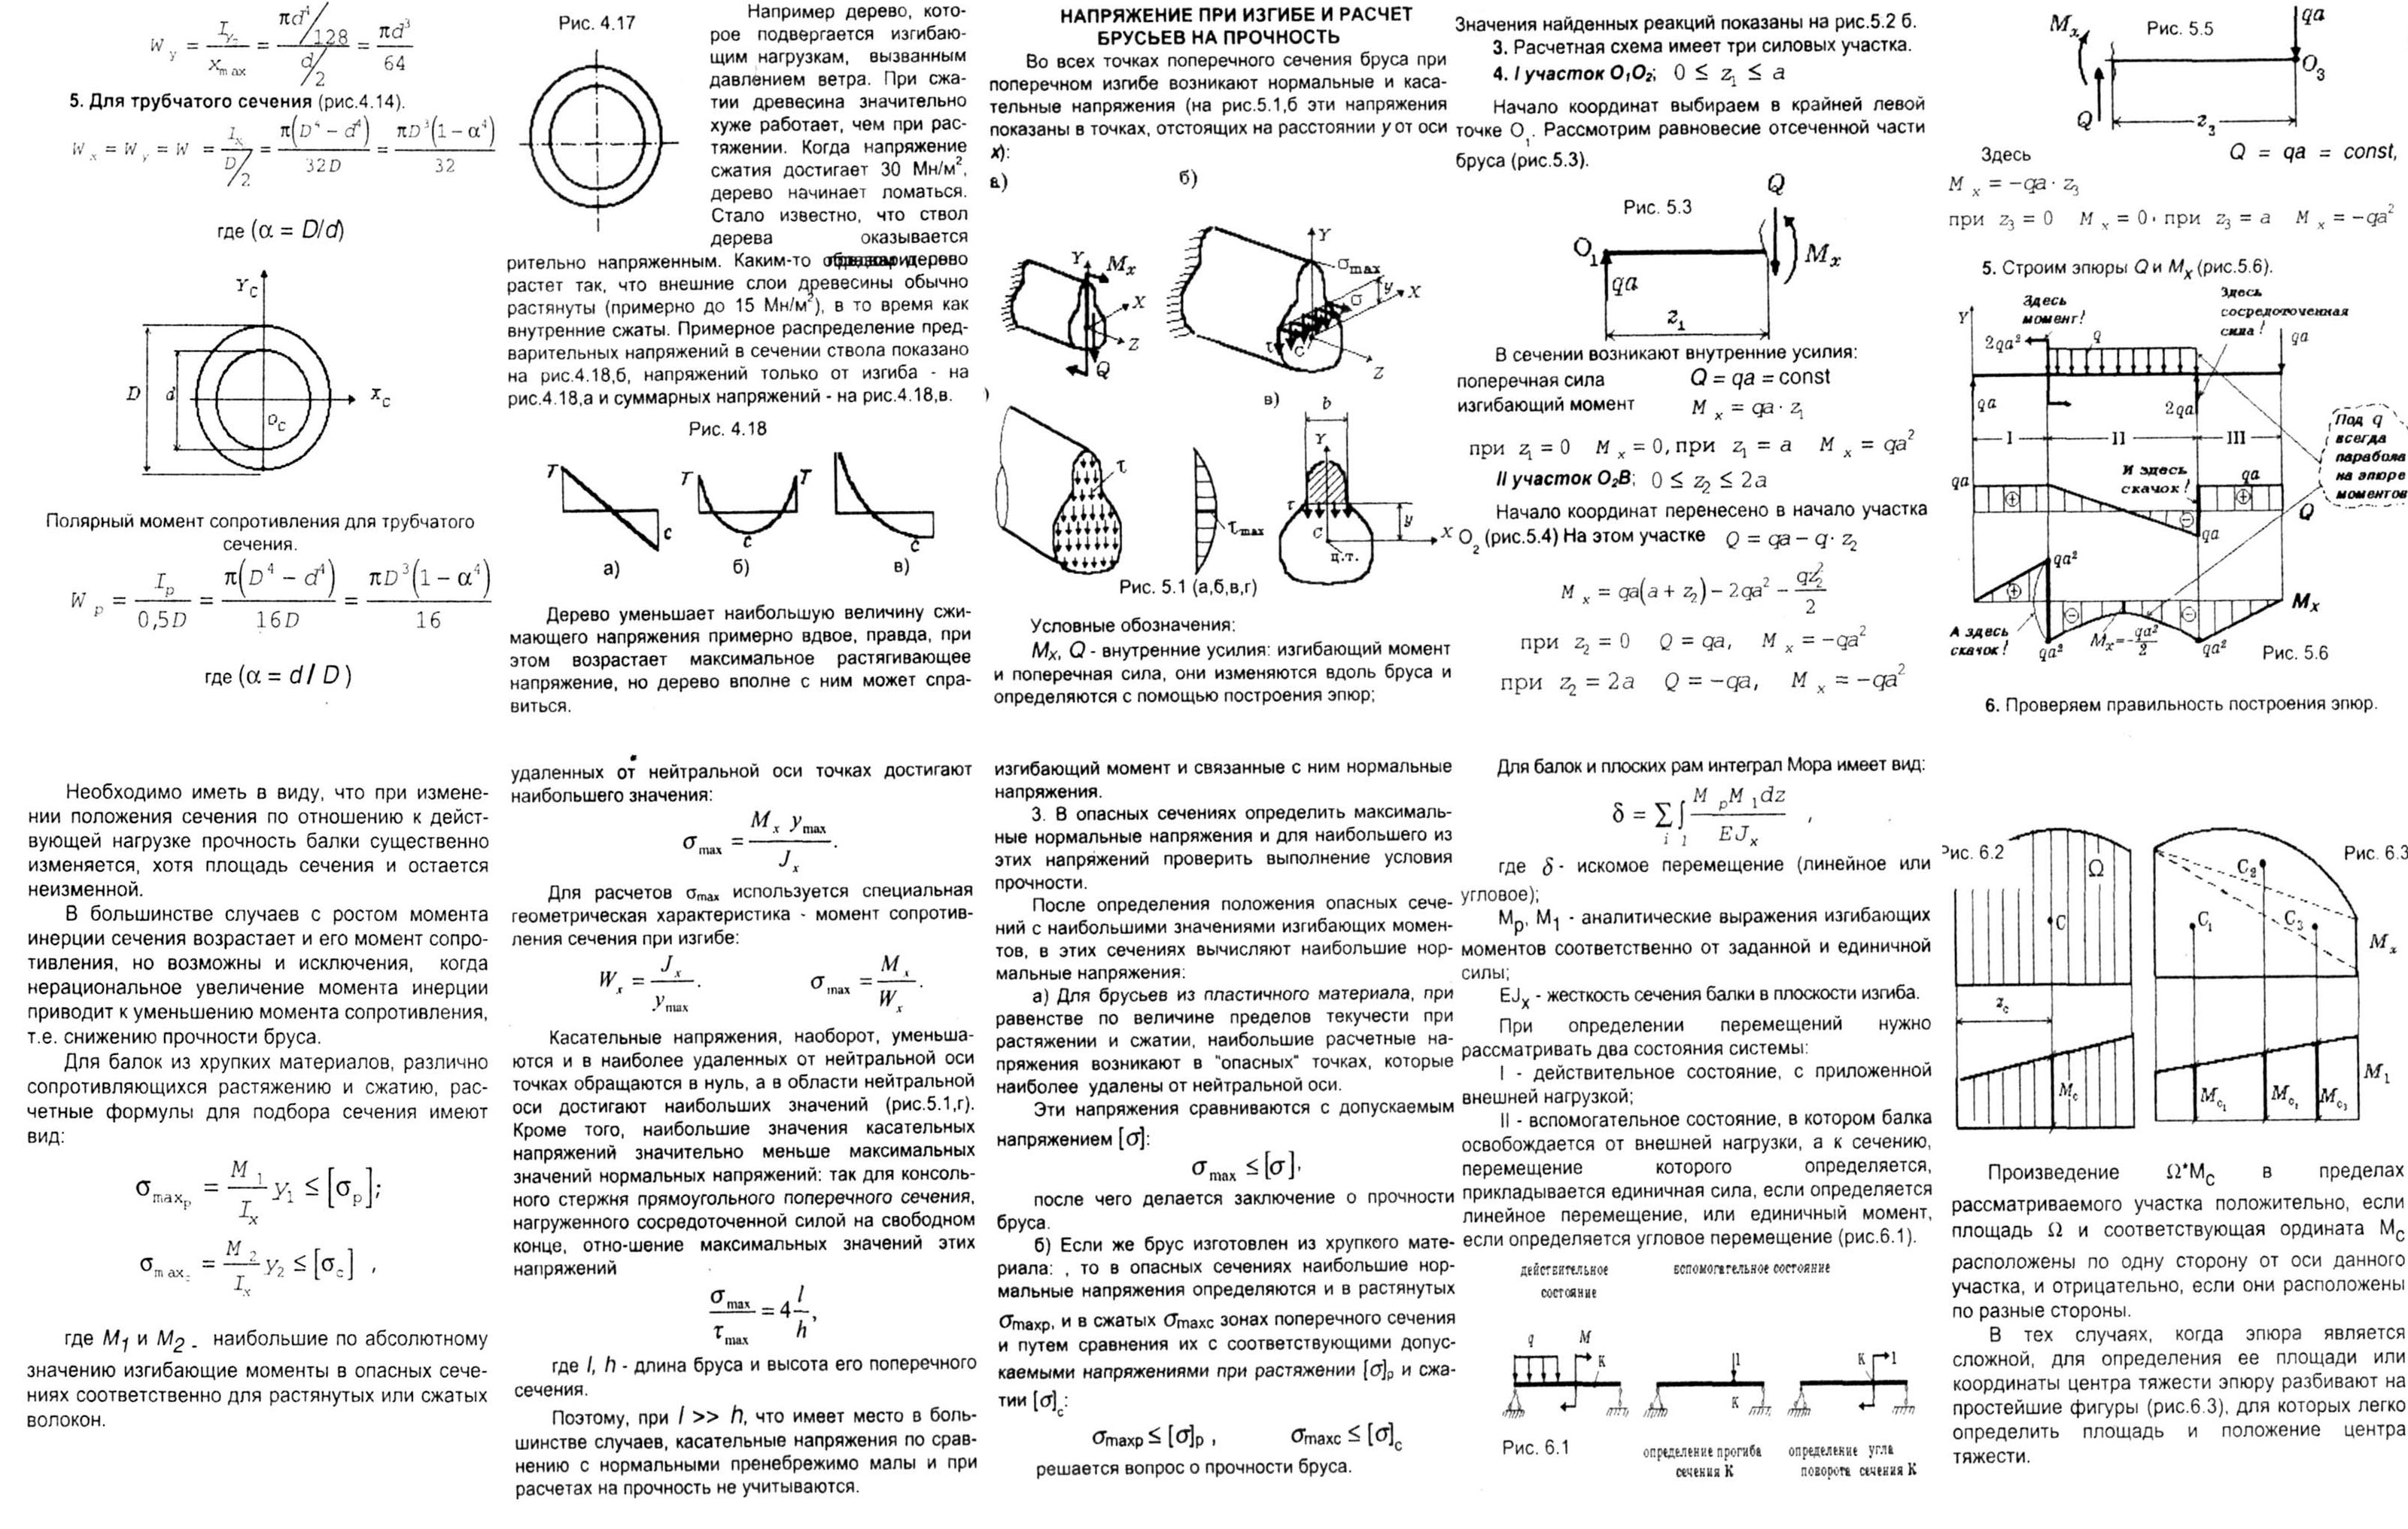 sopromat-shpory-list4b